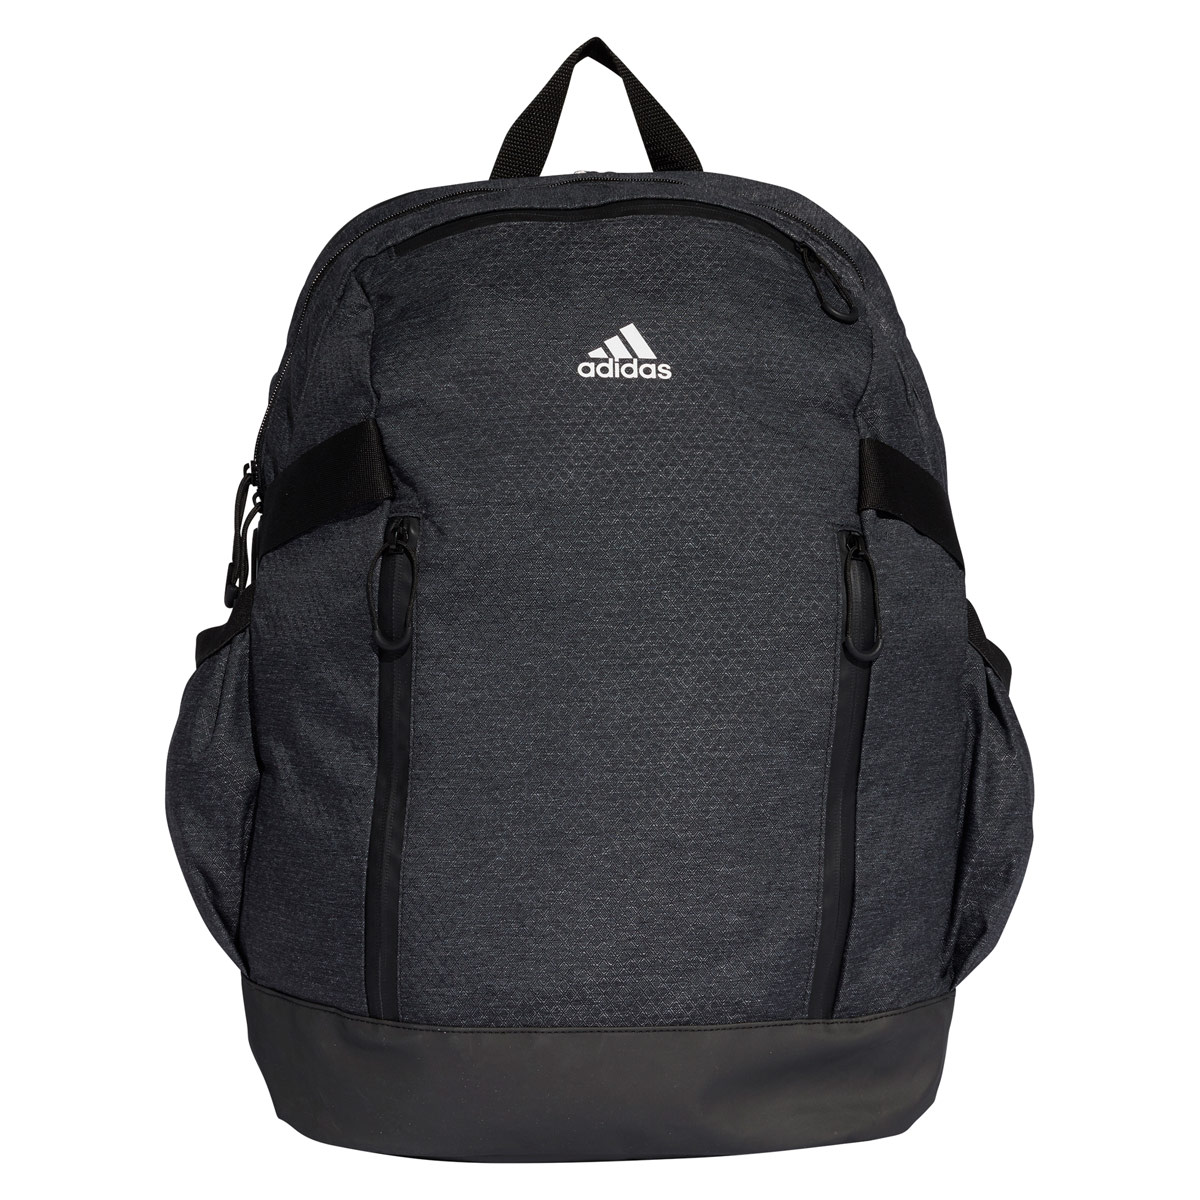 adidas Power Urban Backpack - Backpacks for Men - Black  f149f88c02ea8